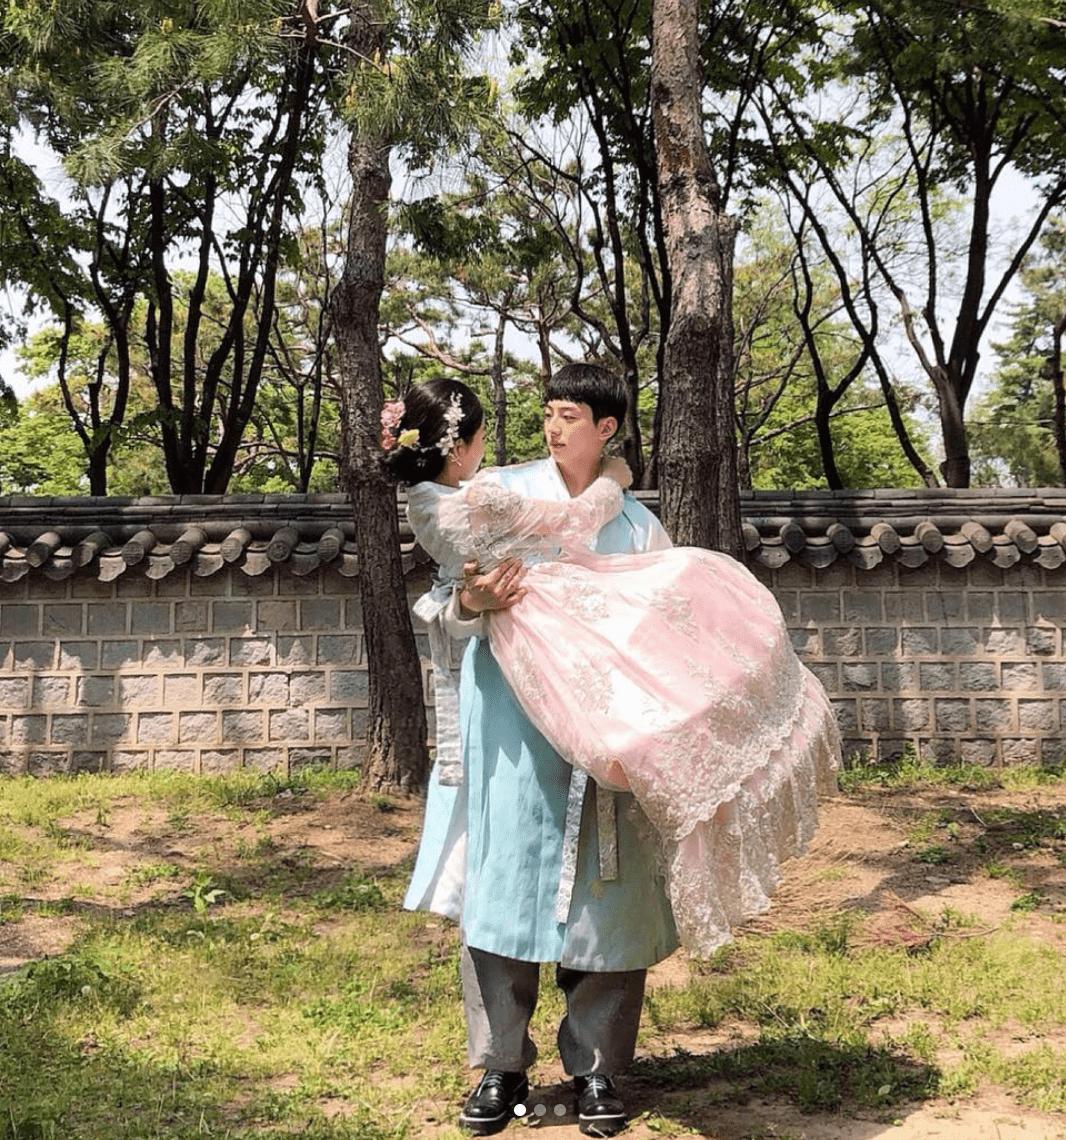 korean-social-media-influencer-instagram-model-yeojun_2.png